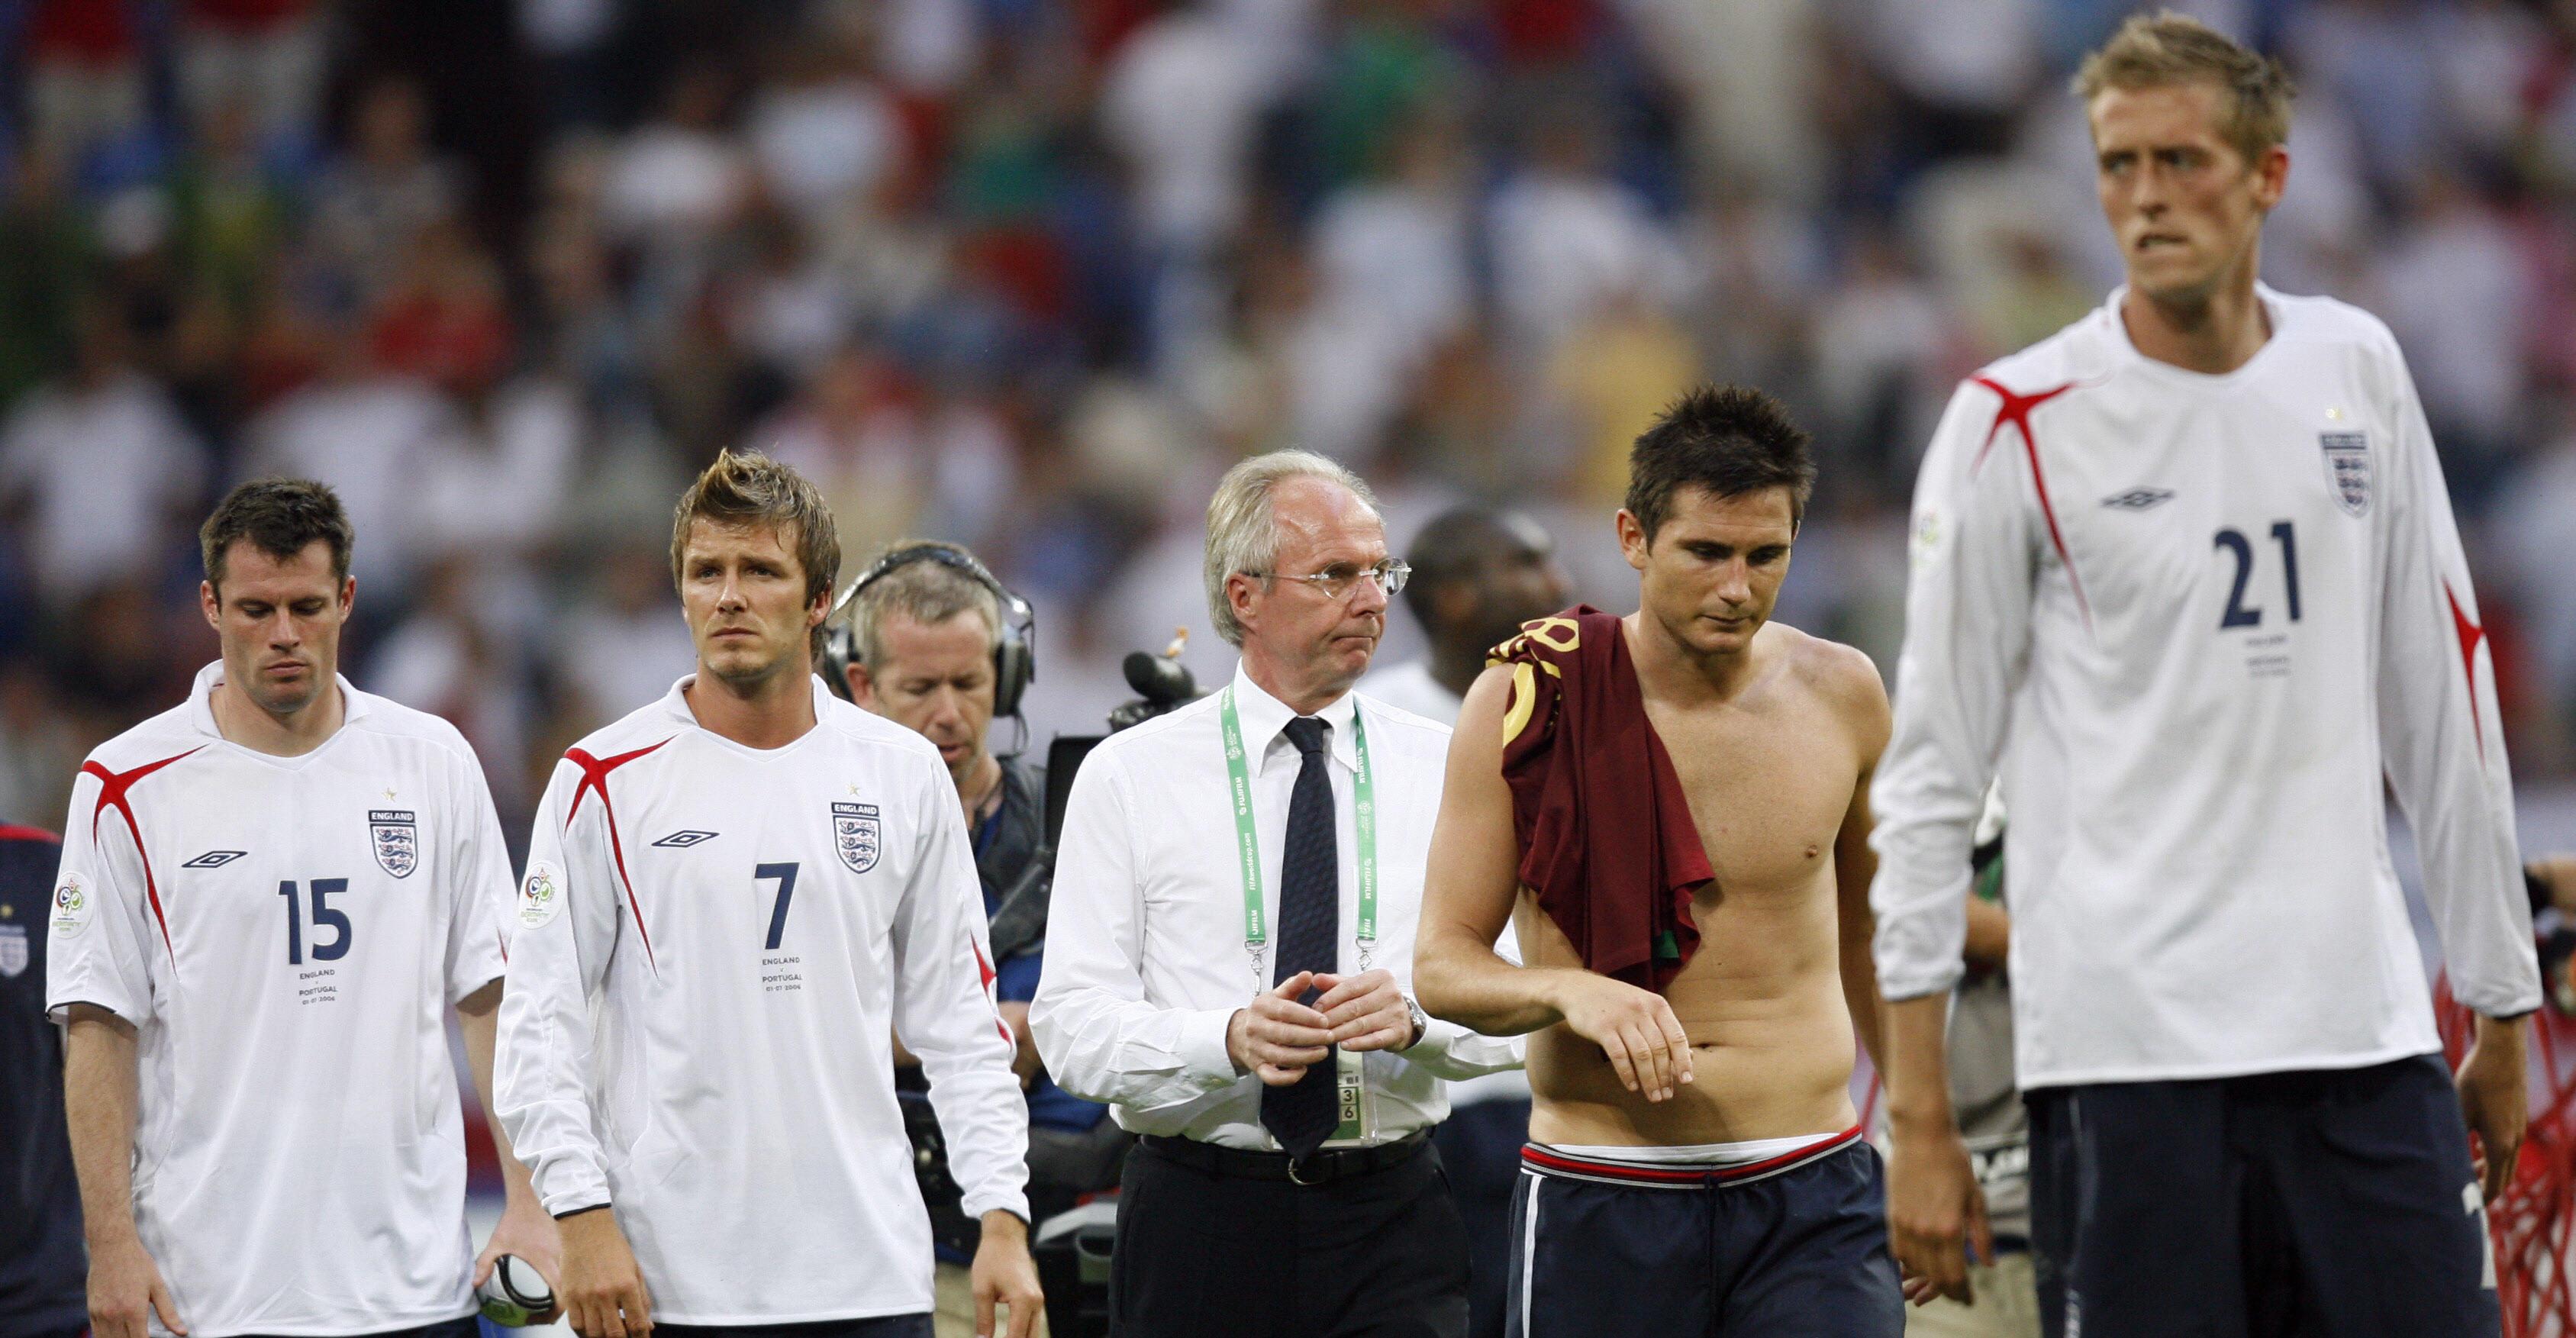 Carragher, David Beckham, Sven-Goran Eriksson, Lampard, Crouch_England